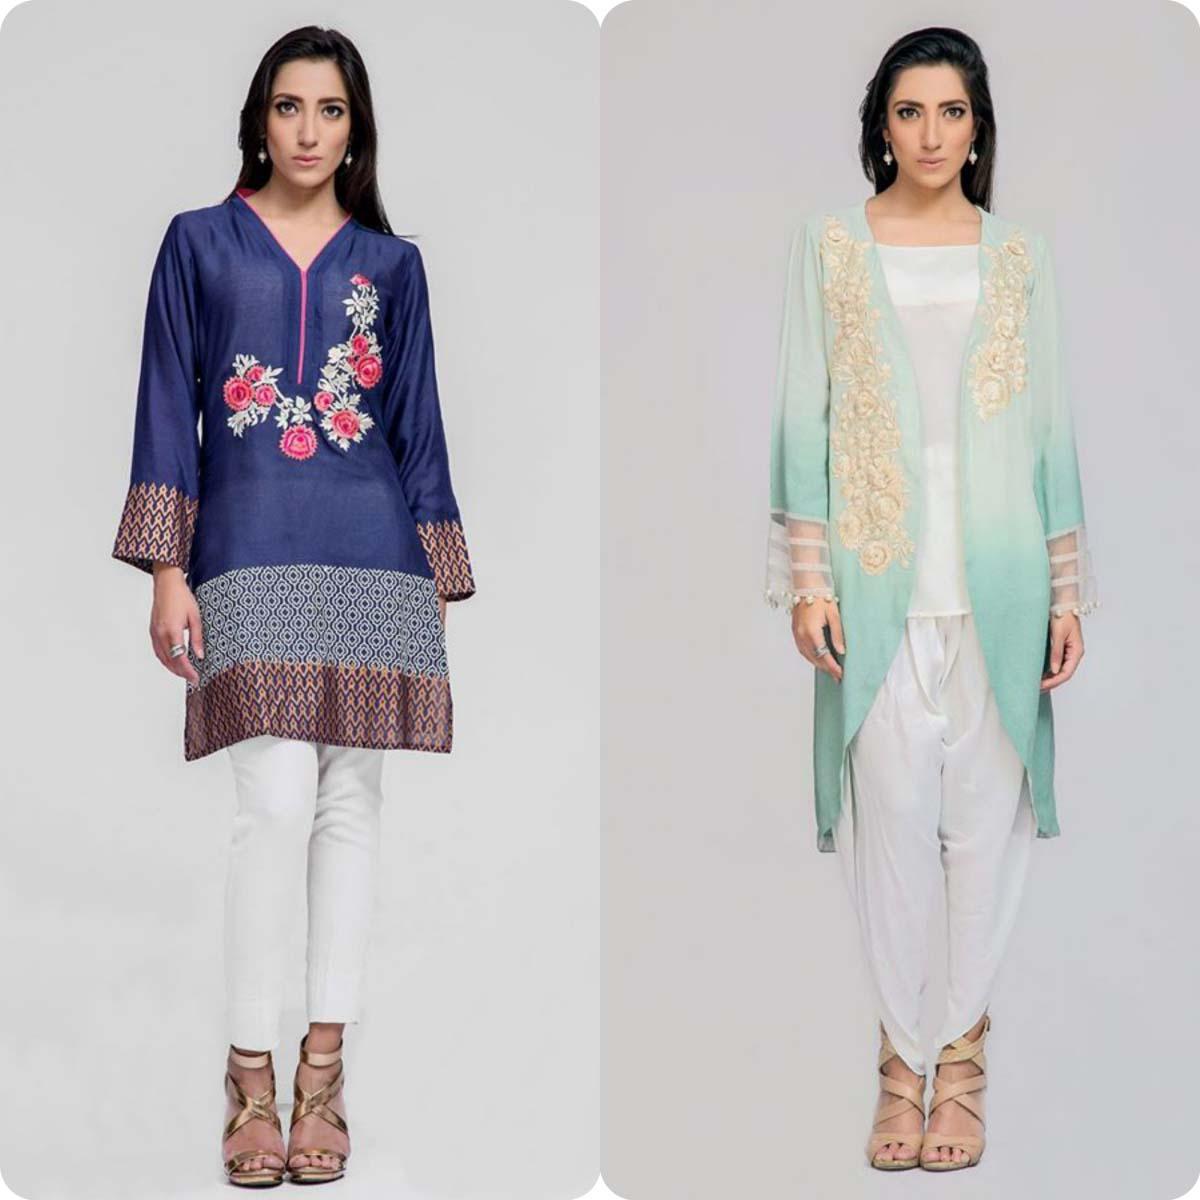 Deepak perwani Luxury Pret Eid Collection for Men and Women 2016-2017 (3)